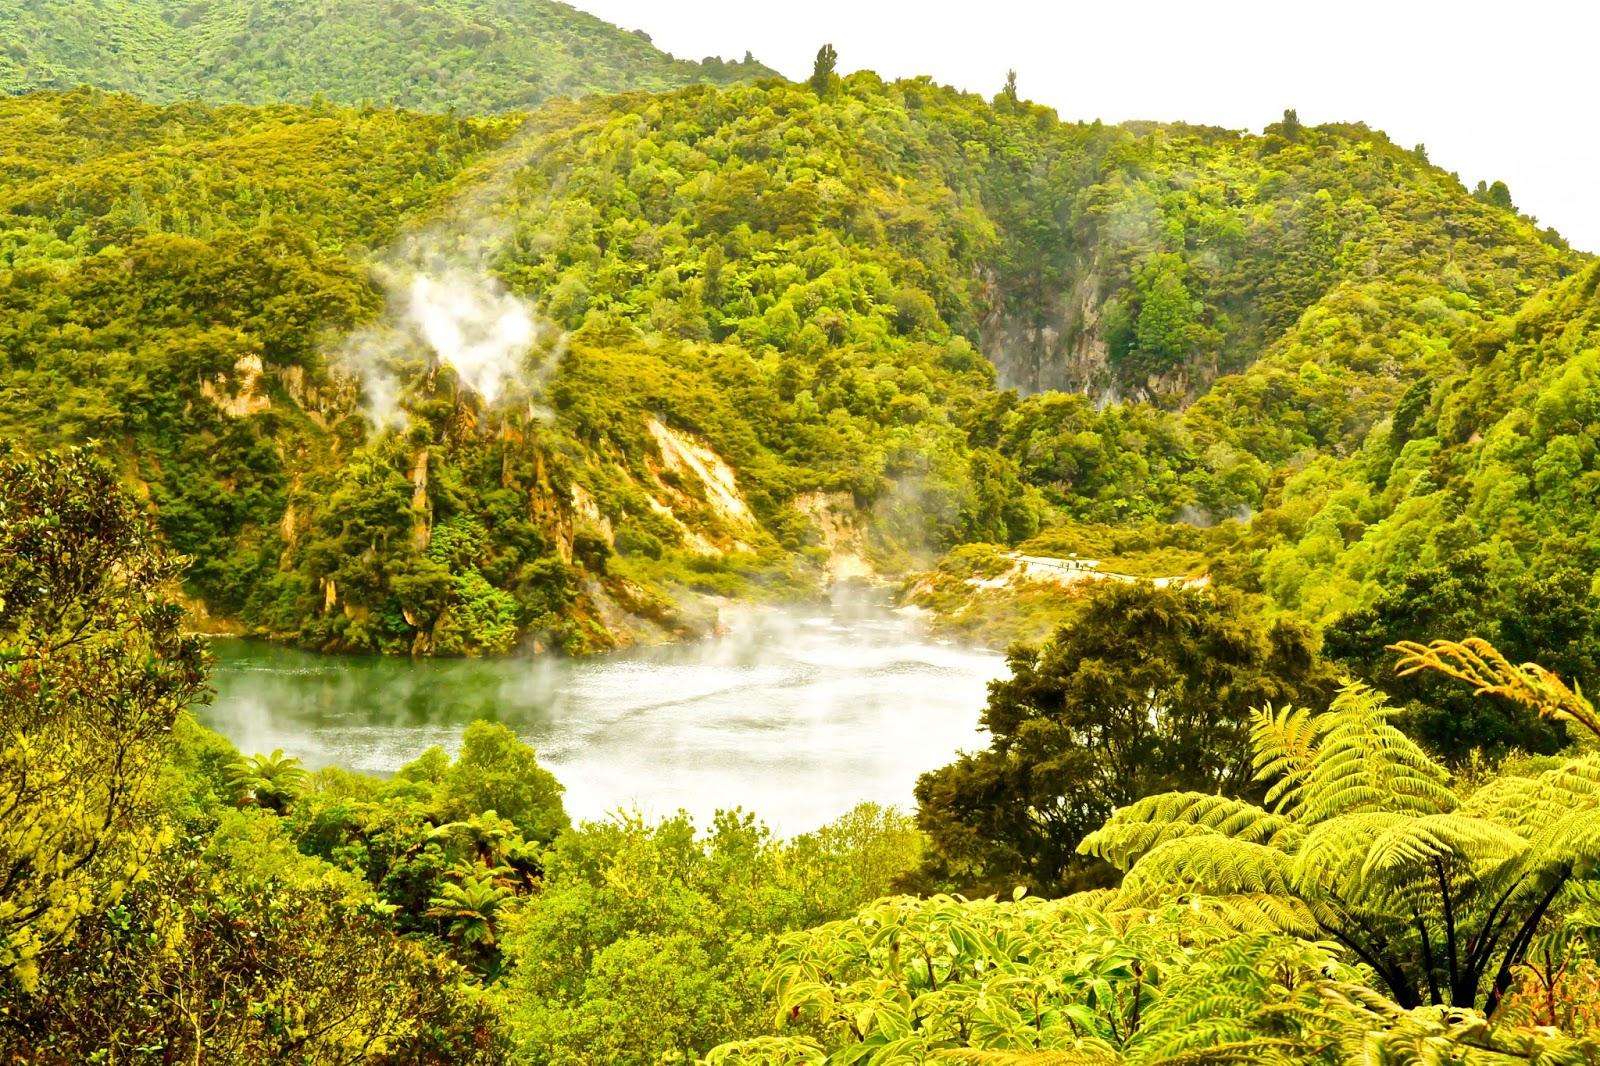 Things to do in Rotorua New Zealand : Geothermal activity at Waimangu Thermal Valley